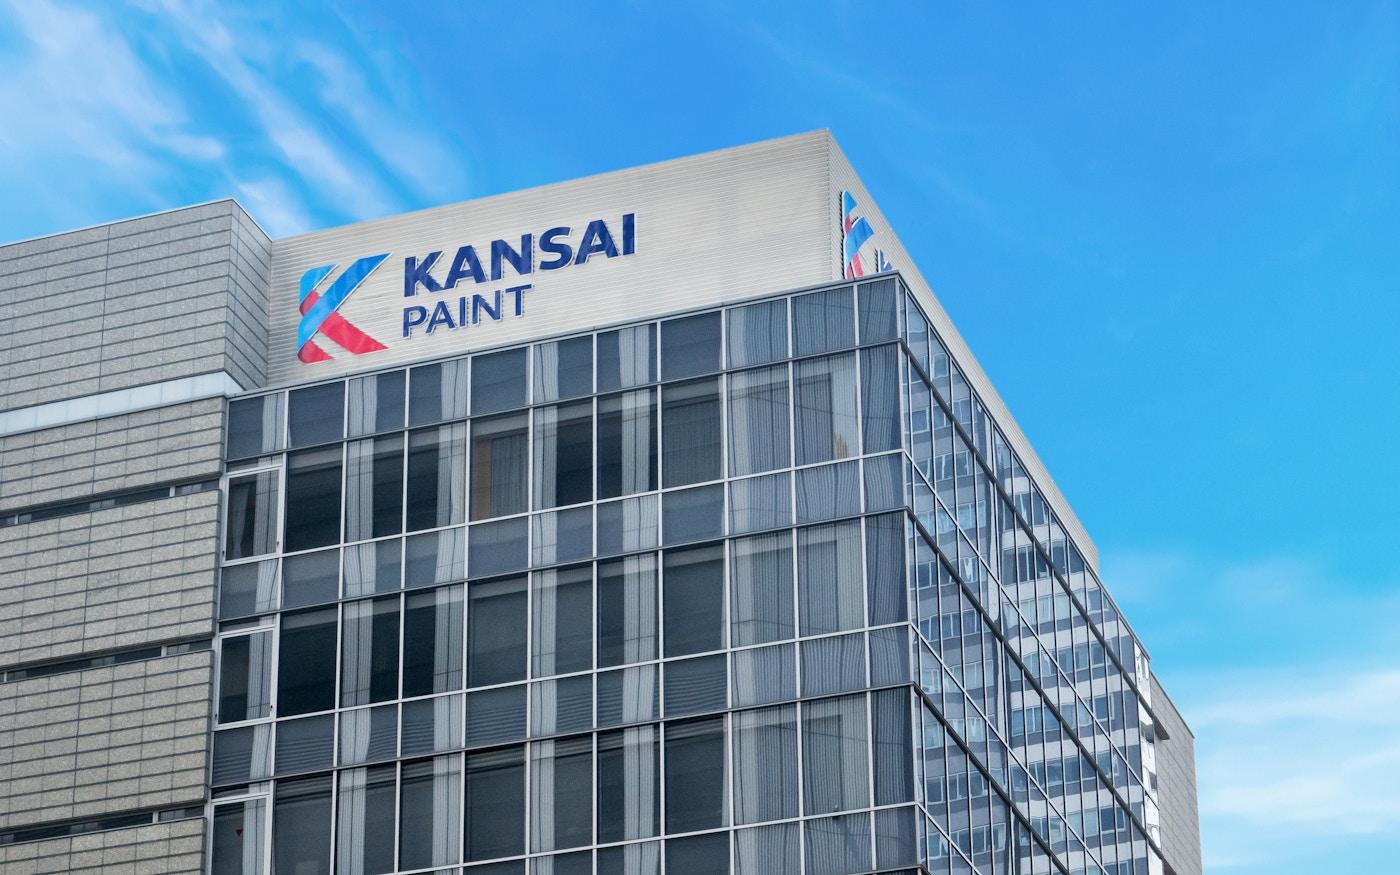 Kansai Paint building